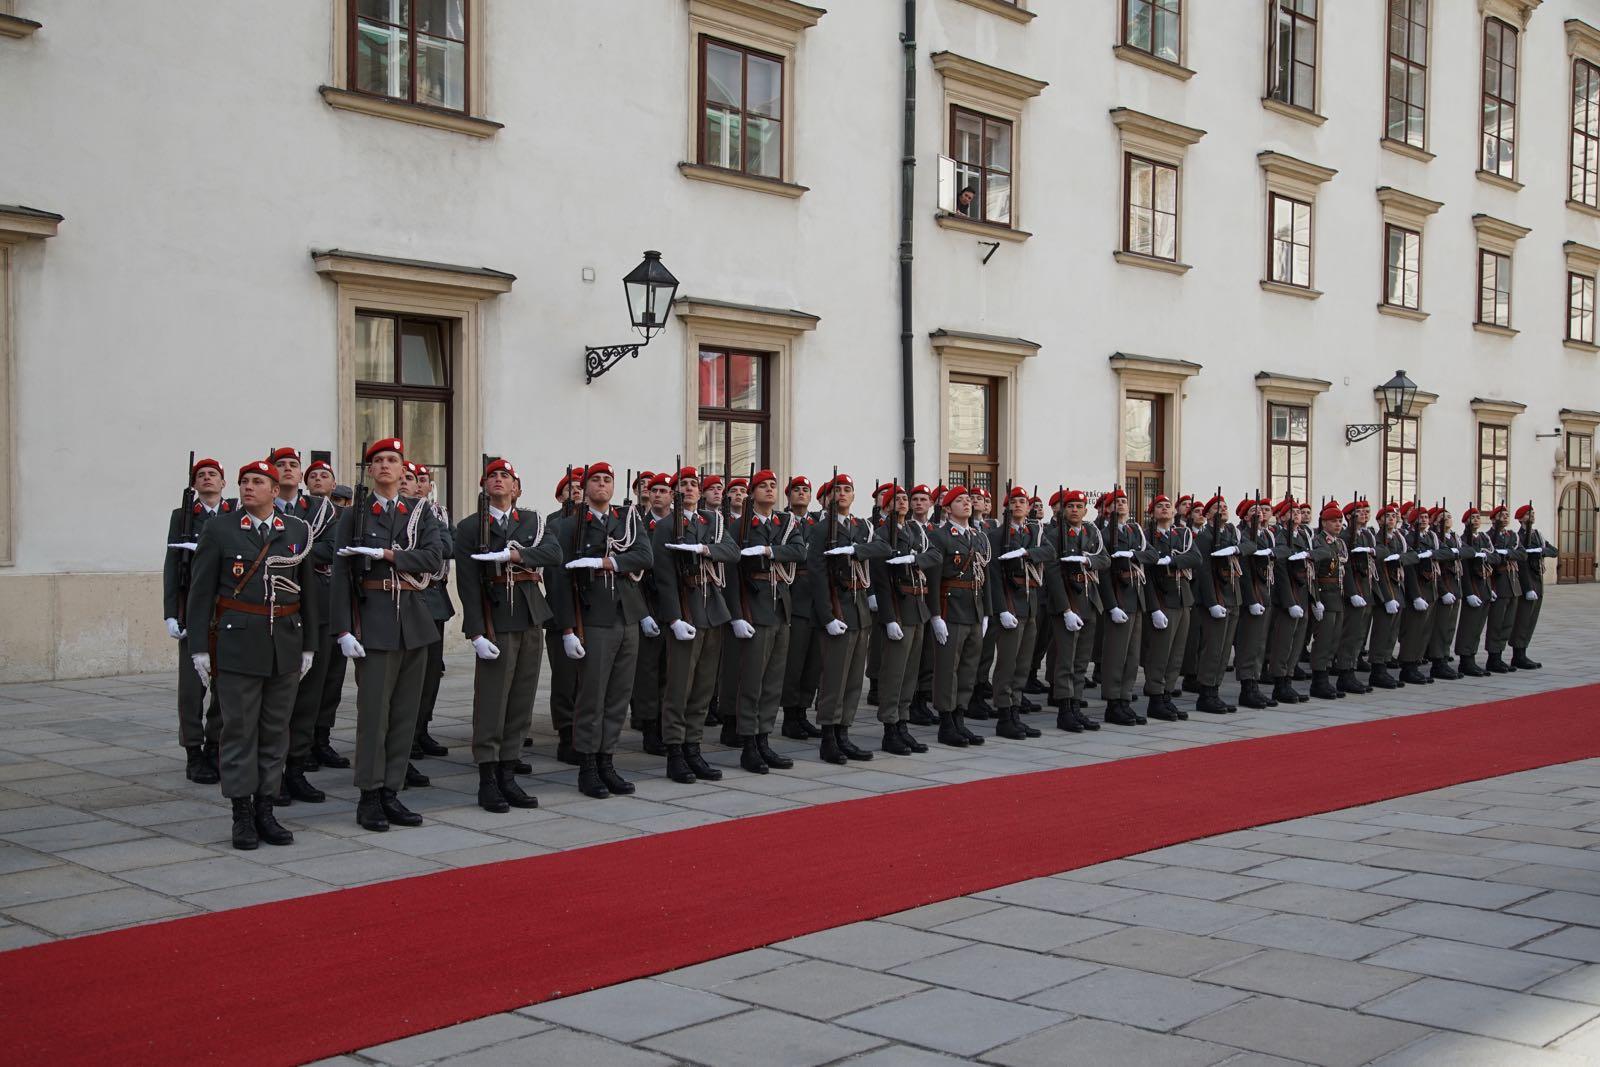 2019_03_05_4Gardekompanie_Empfang_KATAR_HBP_Hofburg - 15 of 21